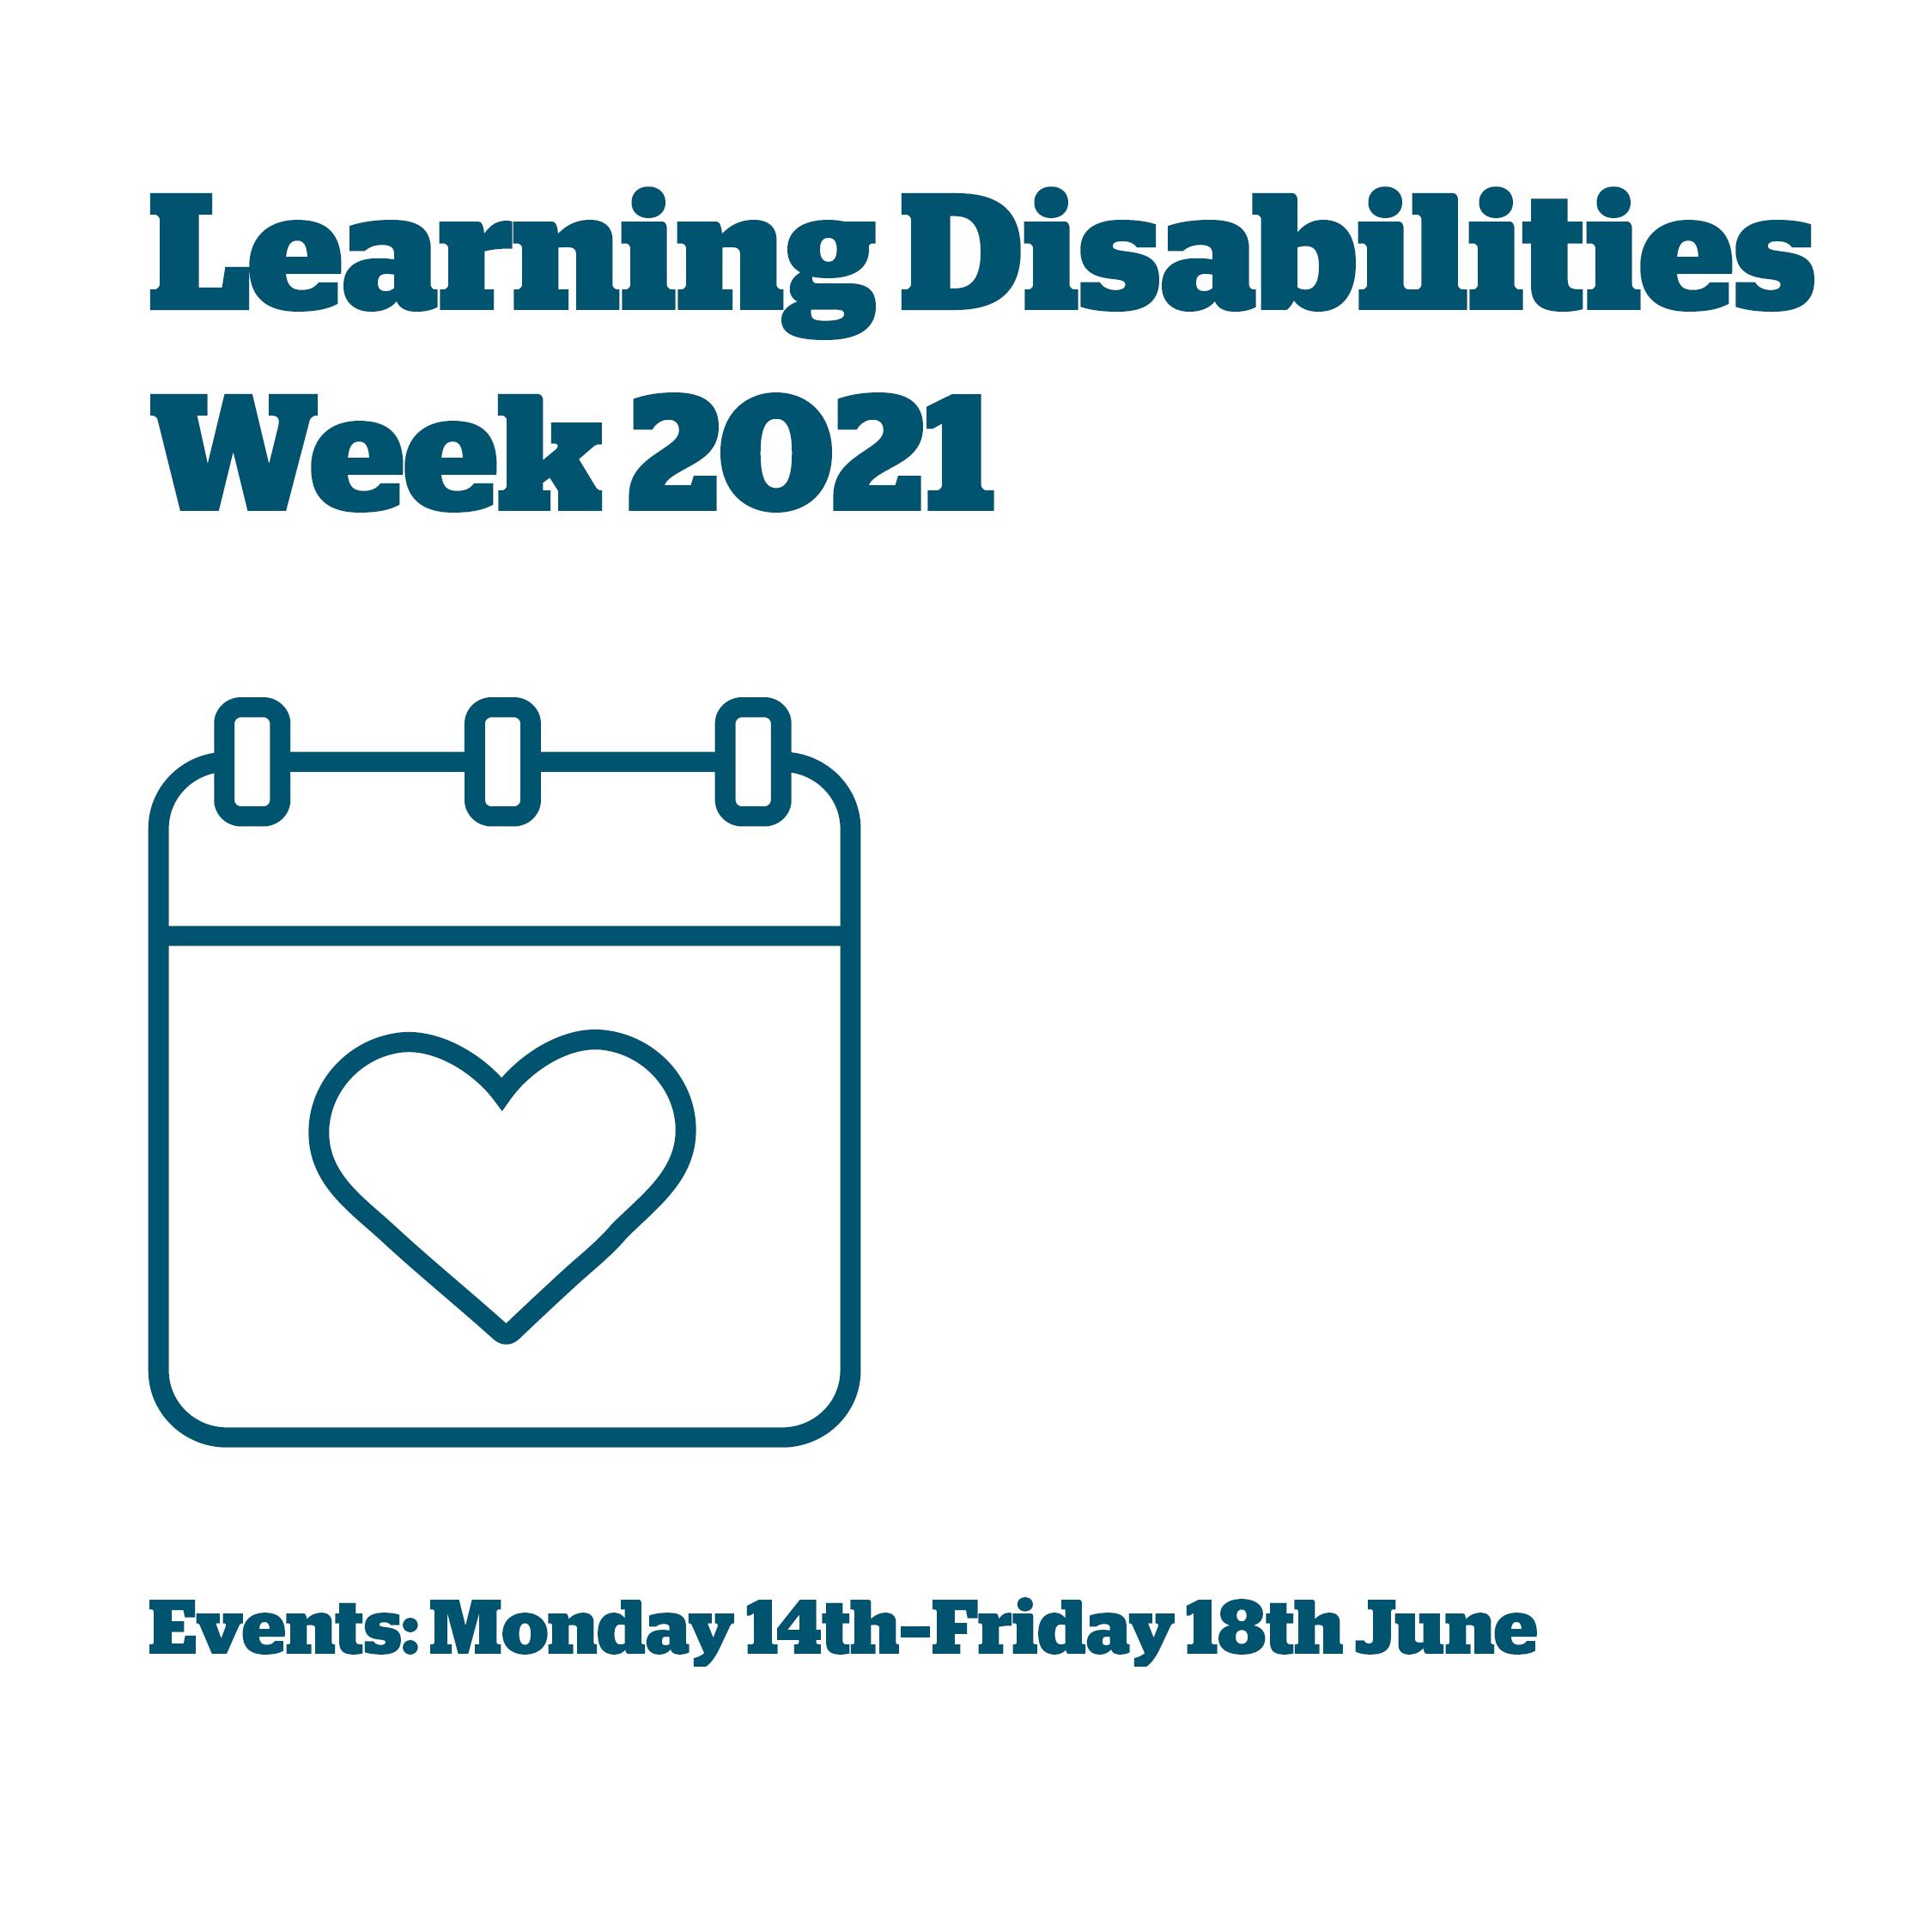 Learning-Disabilties-Week-2021